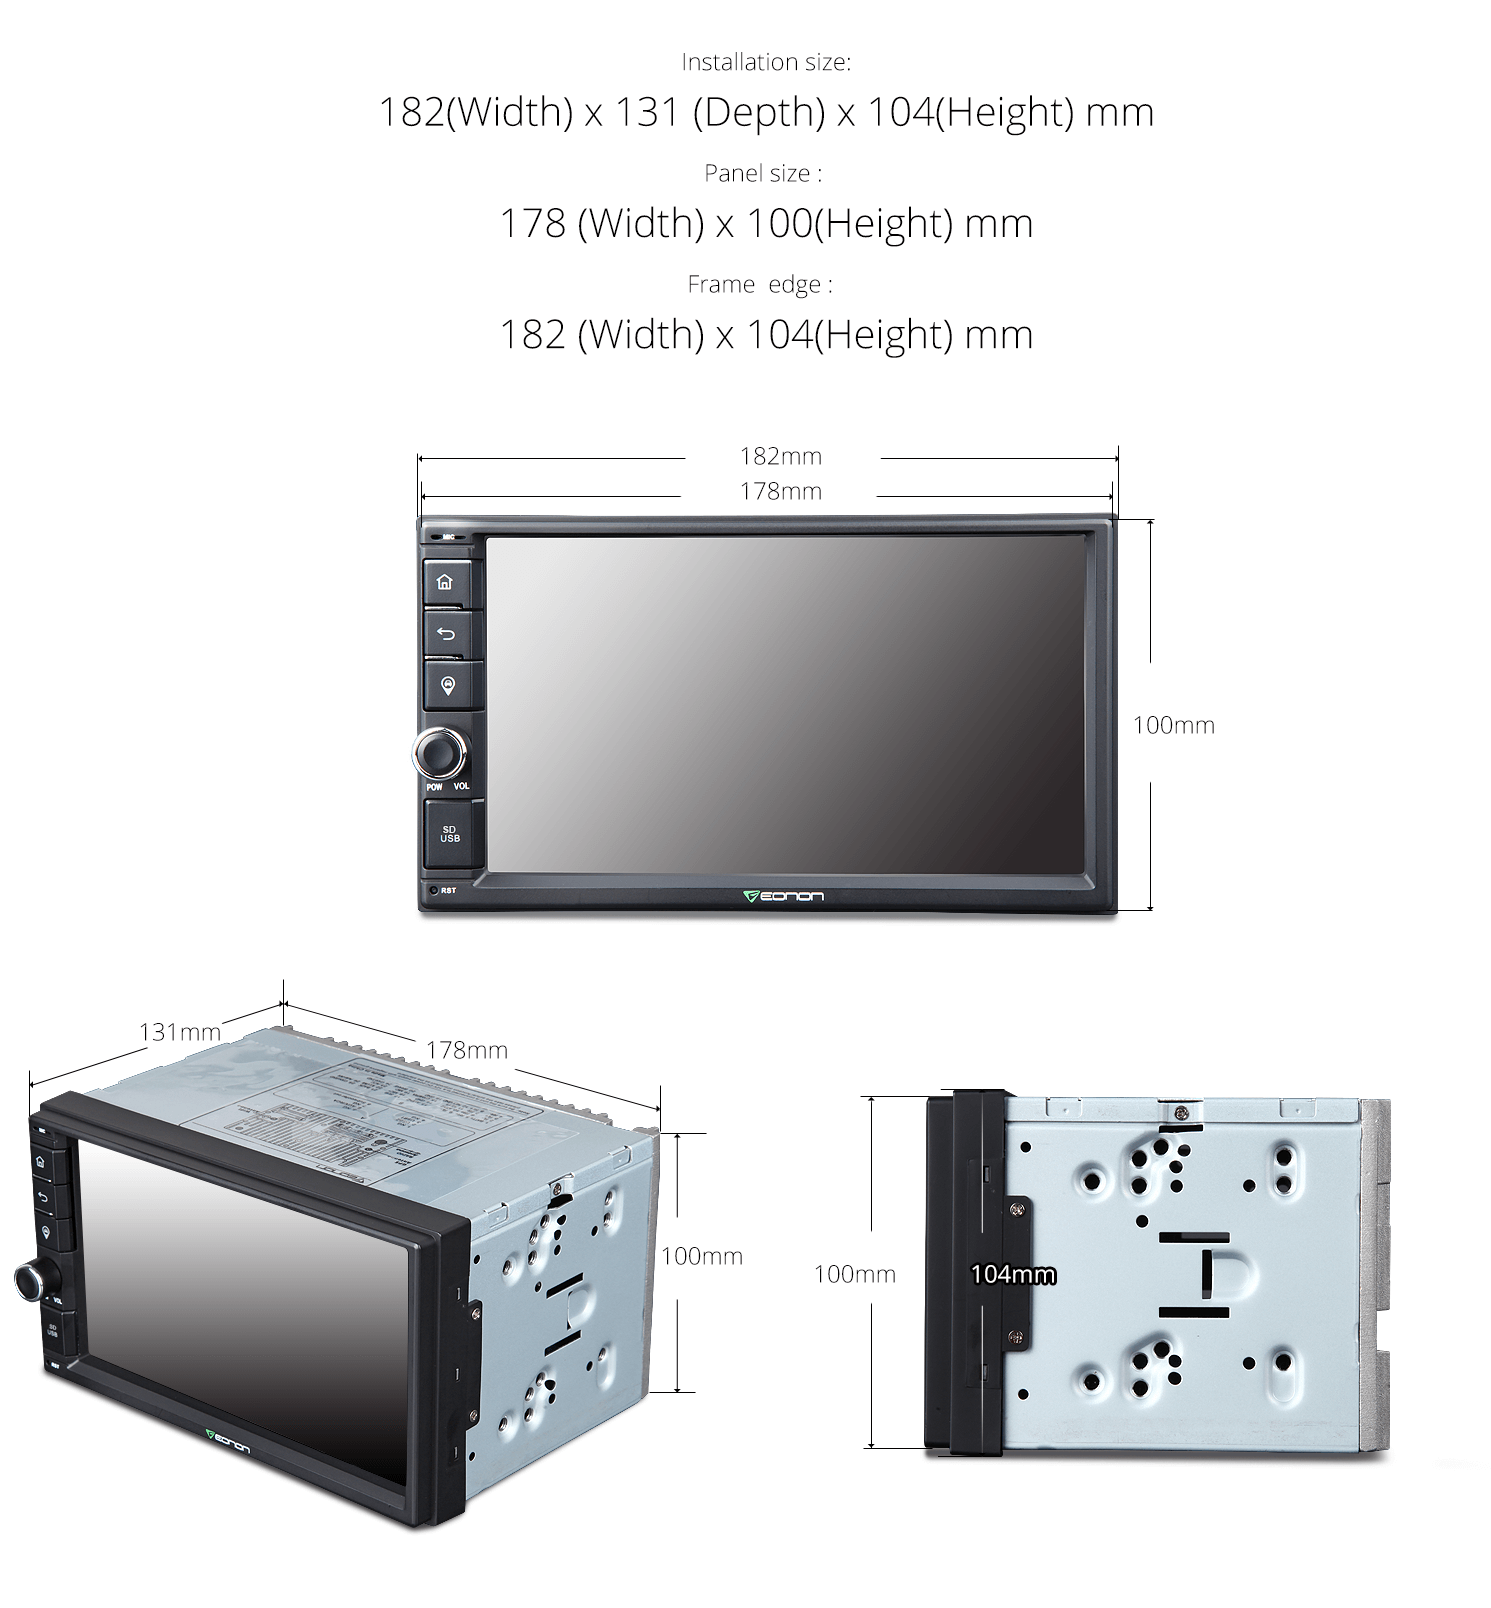 Eonon Ga2162 Car Gps 2 Din Head Unit Android 60 Ez 20brake Controller Wiring Diagram Other Features